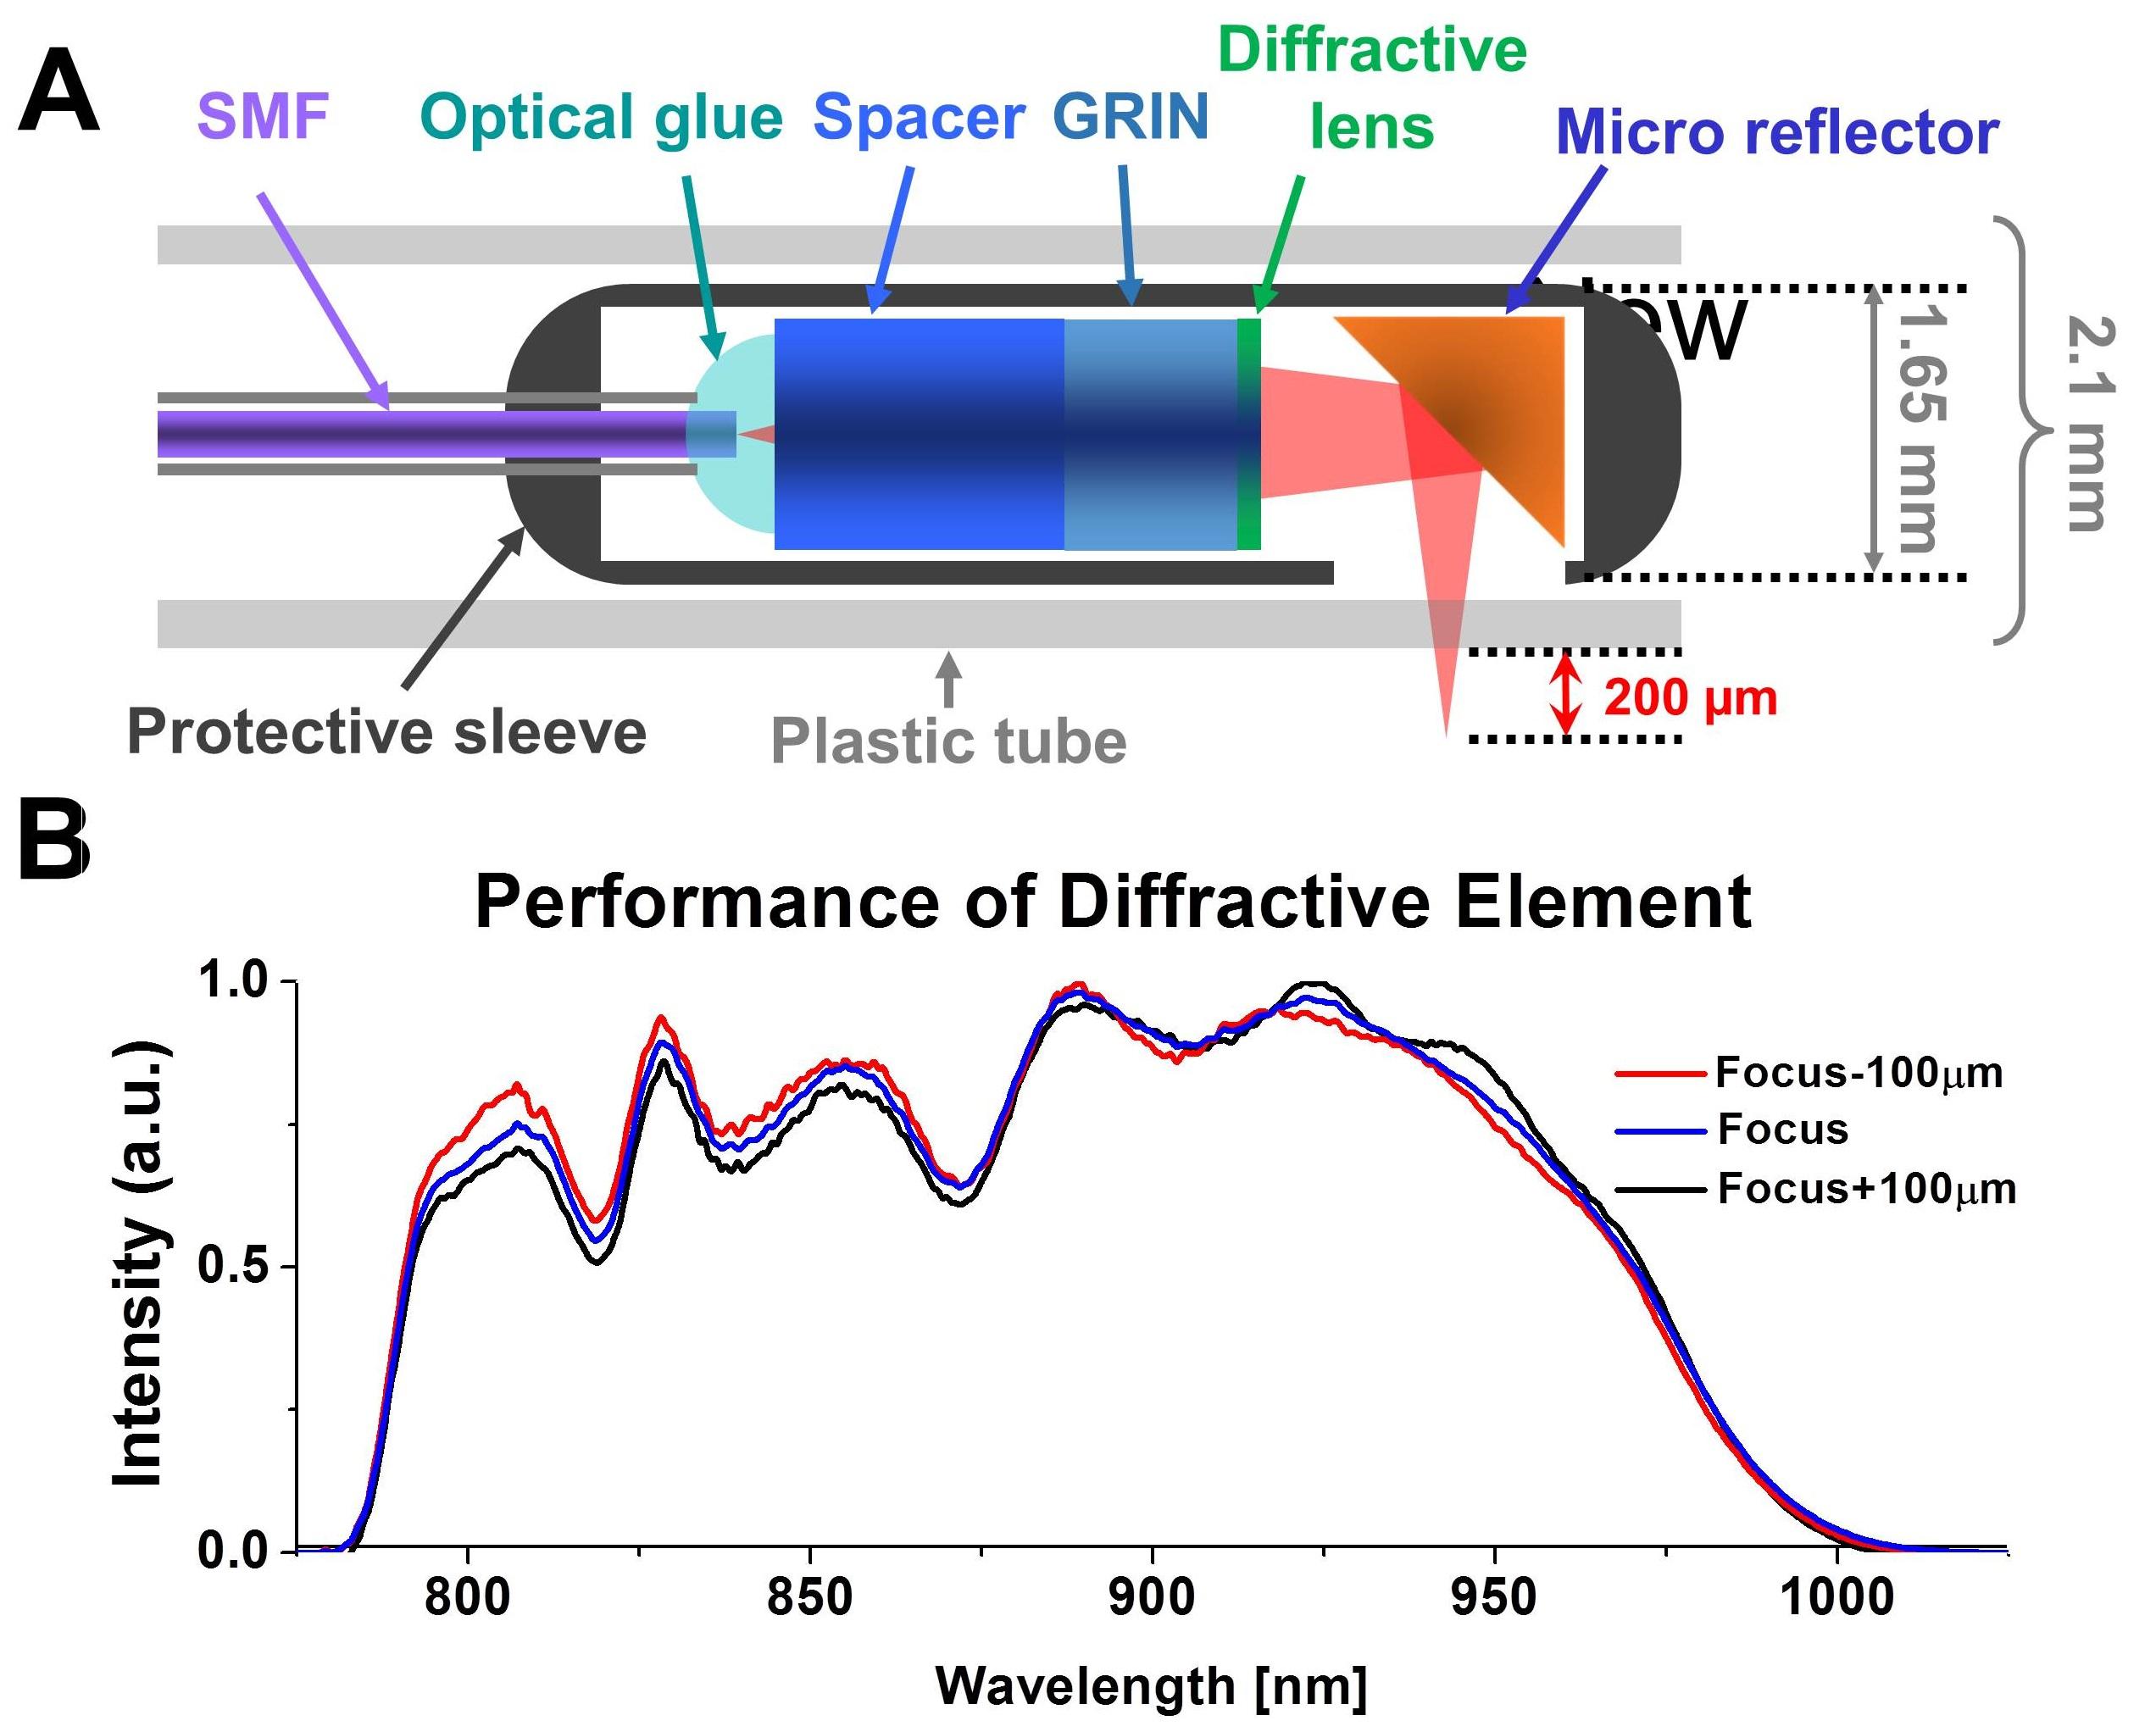 Optical Coherence Tomography Jhu Biophotonics Imaging Technology Fiber Optic Probe Diagram Figure 9